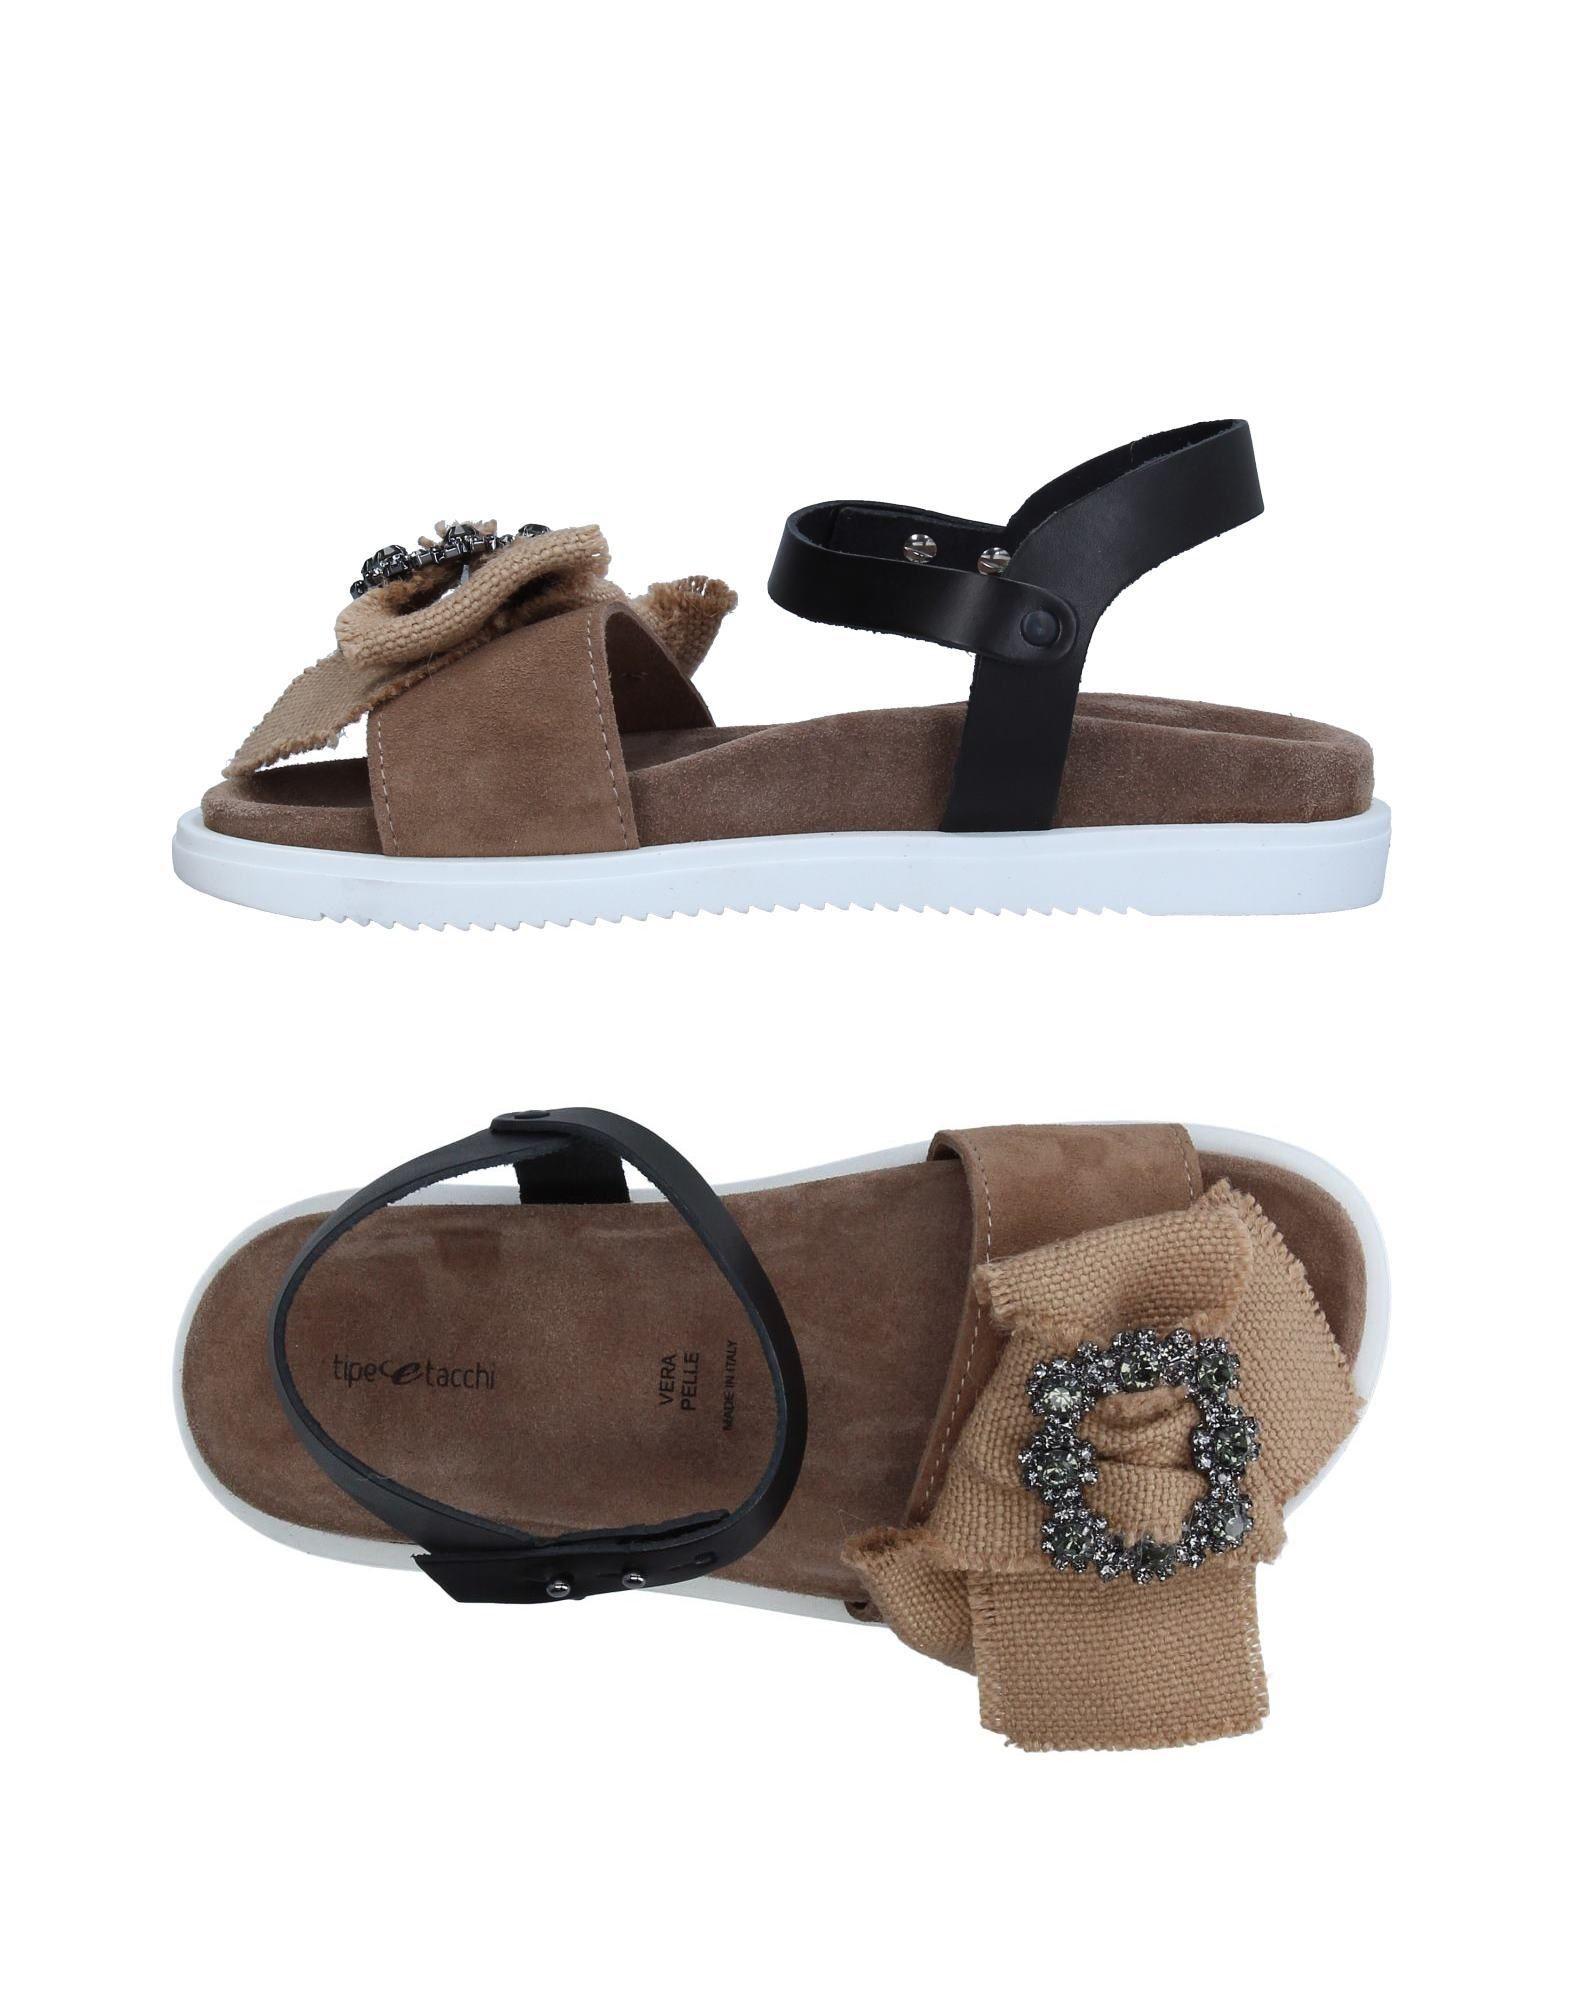 Tipe E Tacchi Sandalen Damen  11332488NJ Gute Qualität beliebte Schuhe